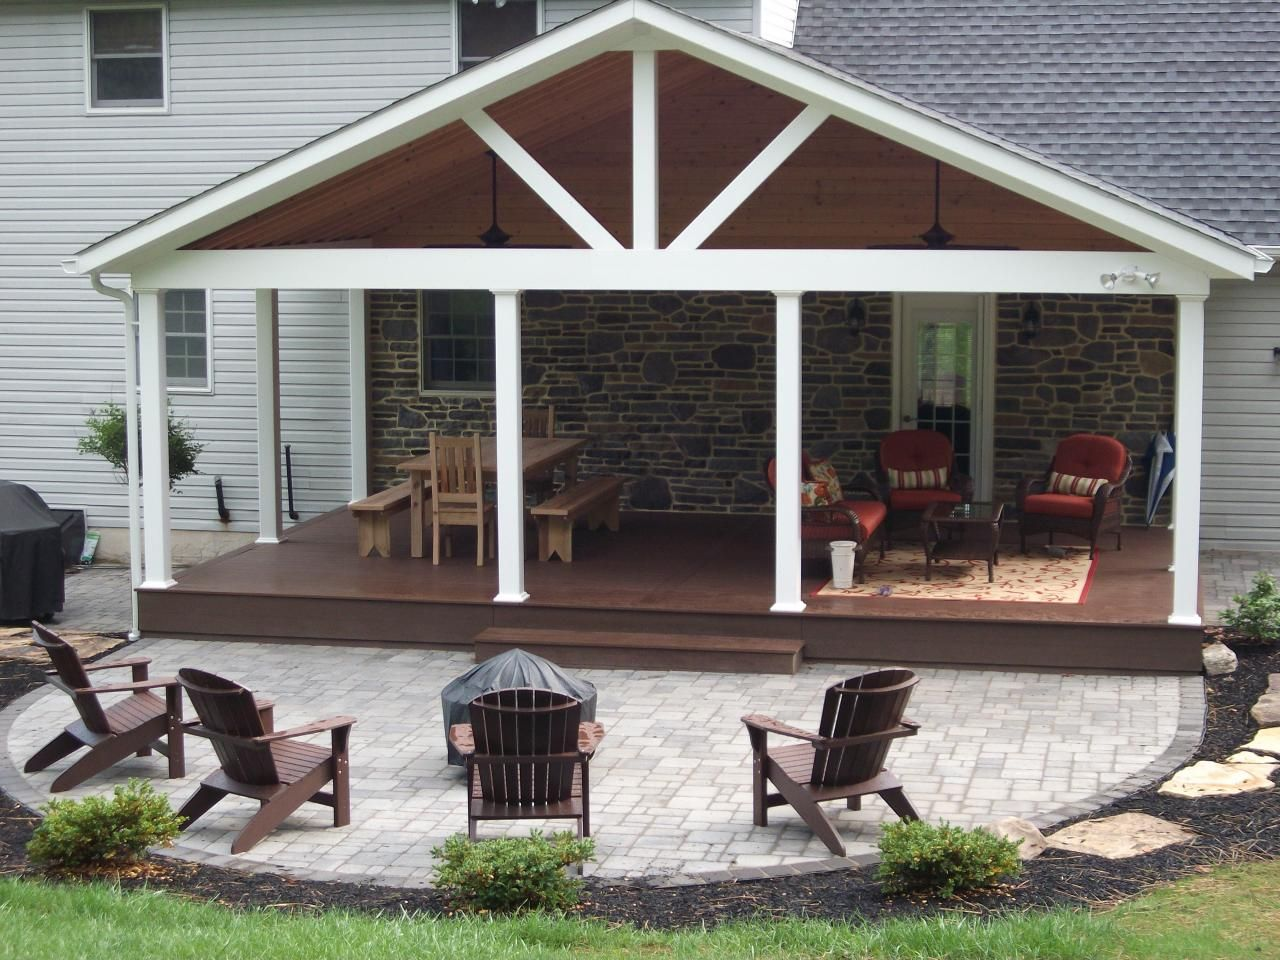 Deck With No Railing Covered Decks Backyard Renovations Deck Photos